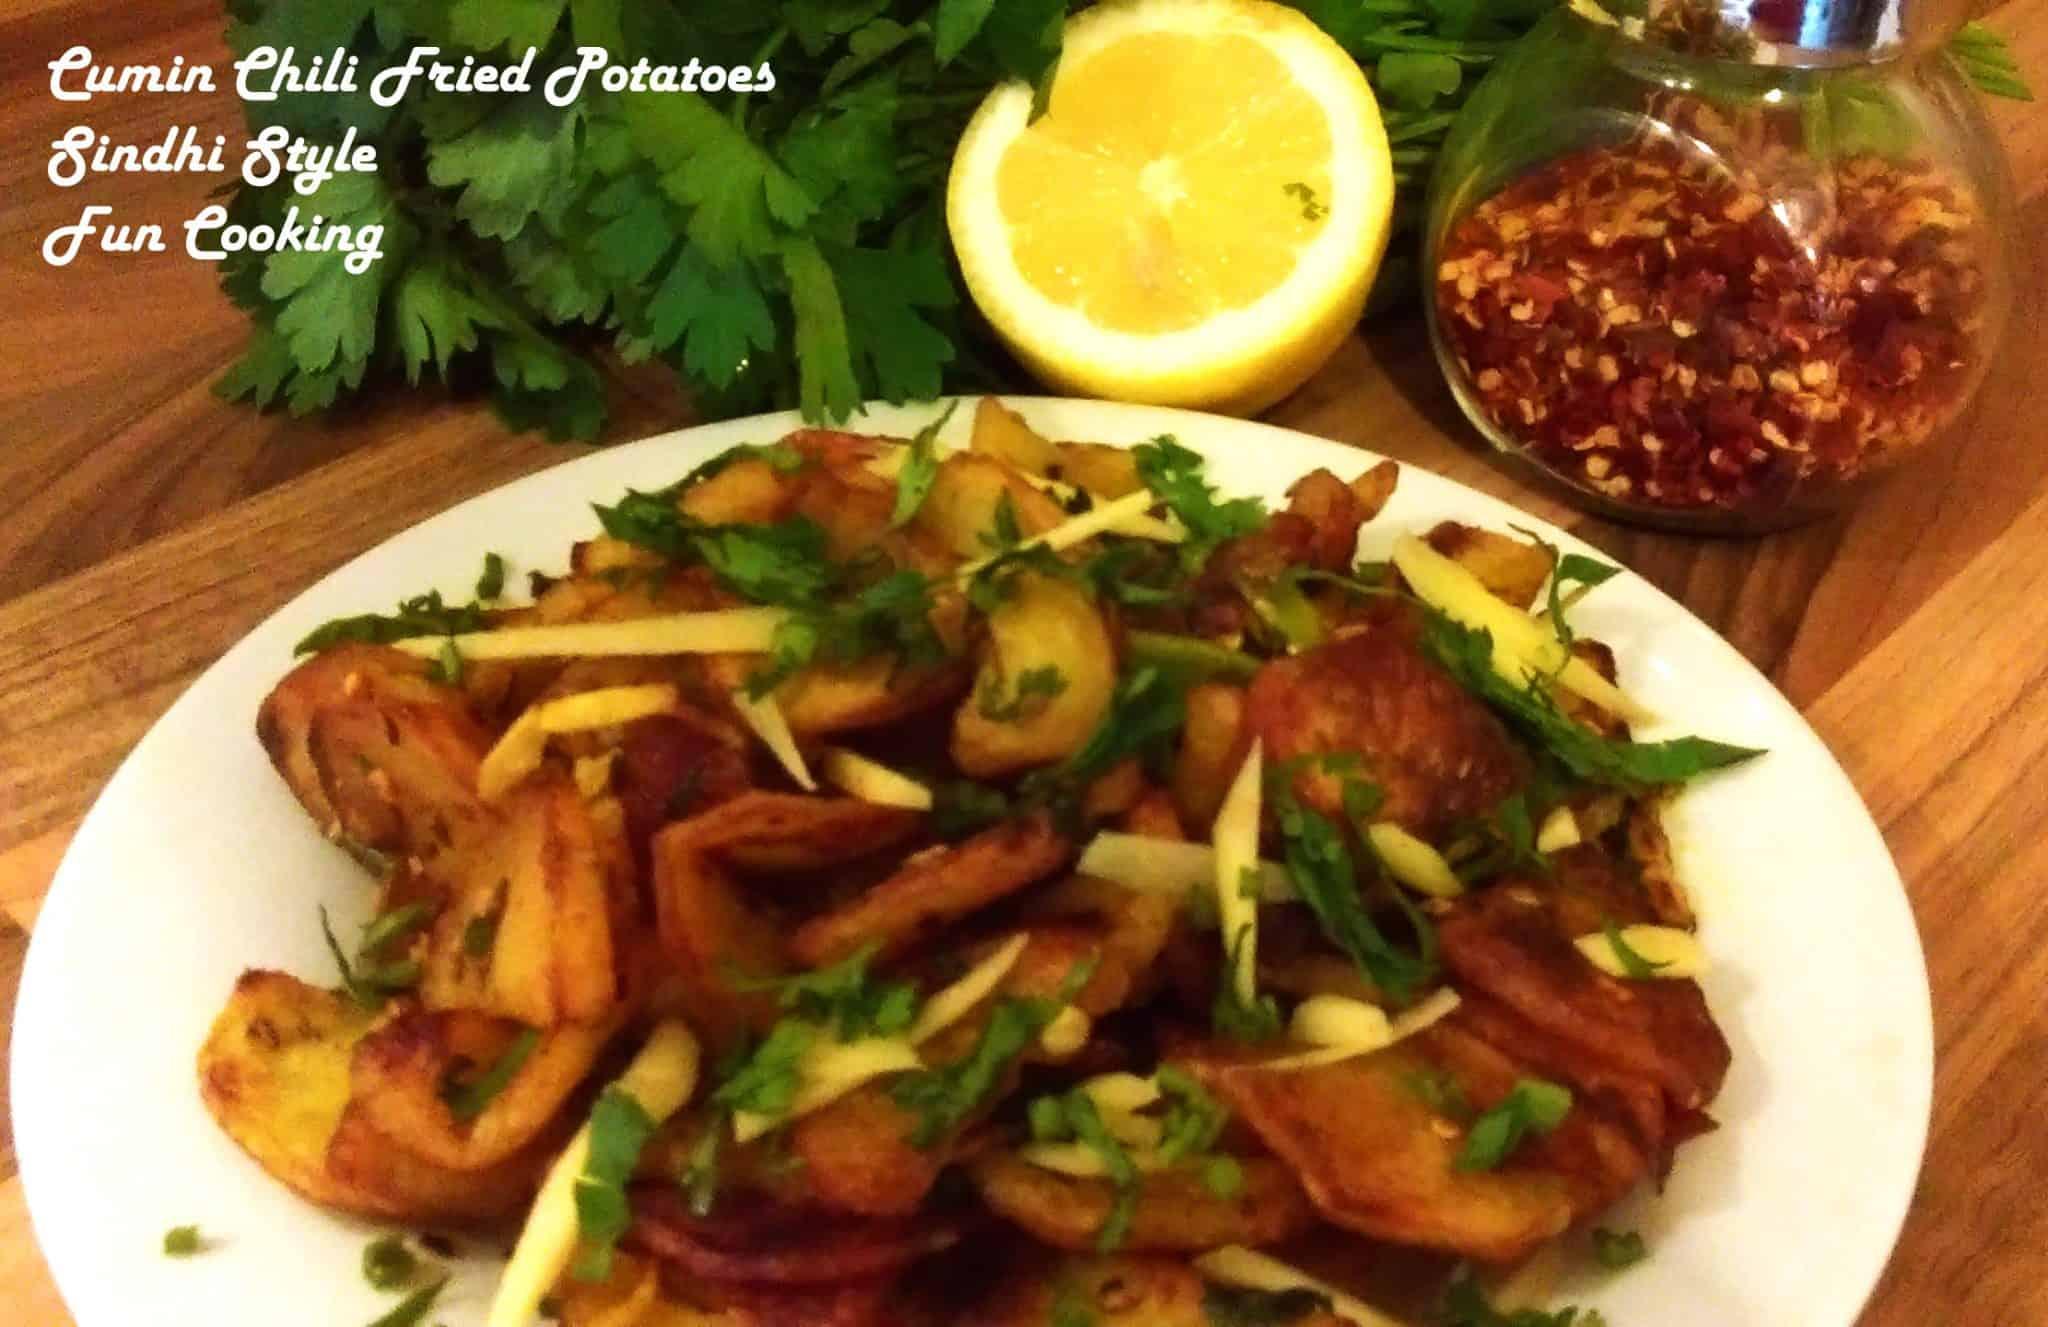 Cumin Chili Fried Potatoes Sindhi Style Fun Cooking